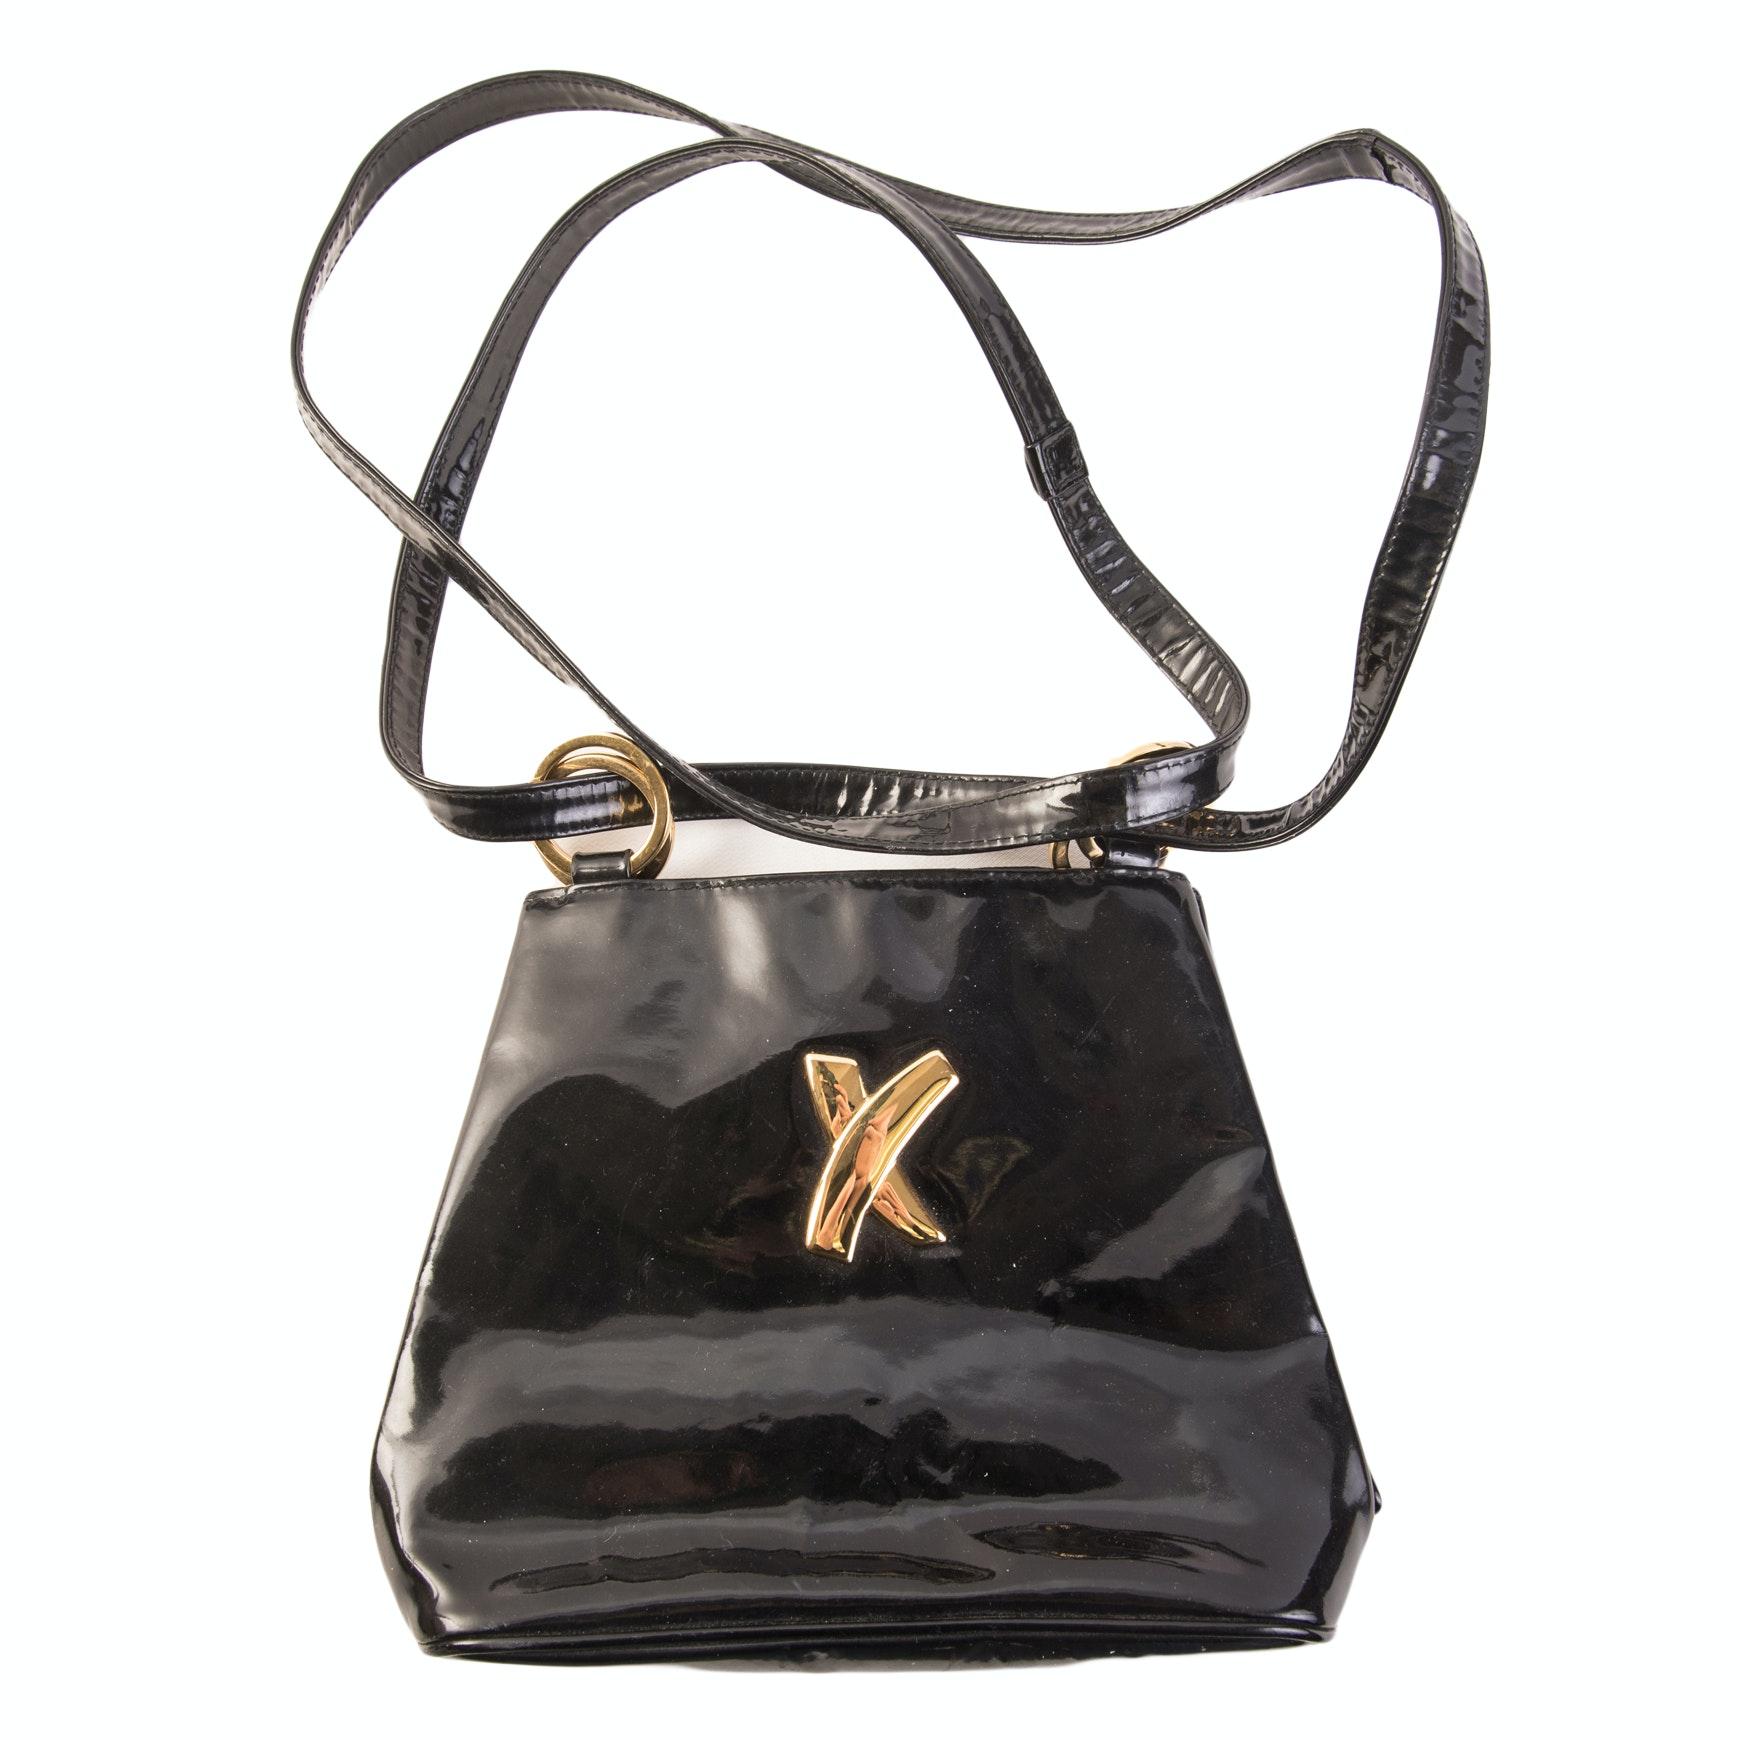 Vintage Paloma Picasso Black Patent Leather Handbag